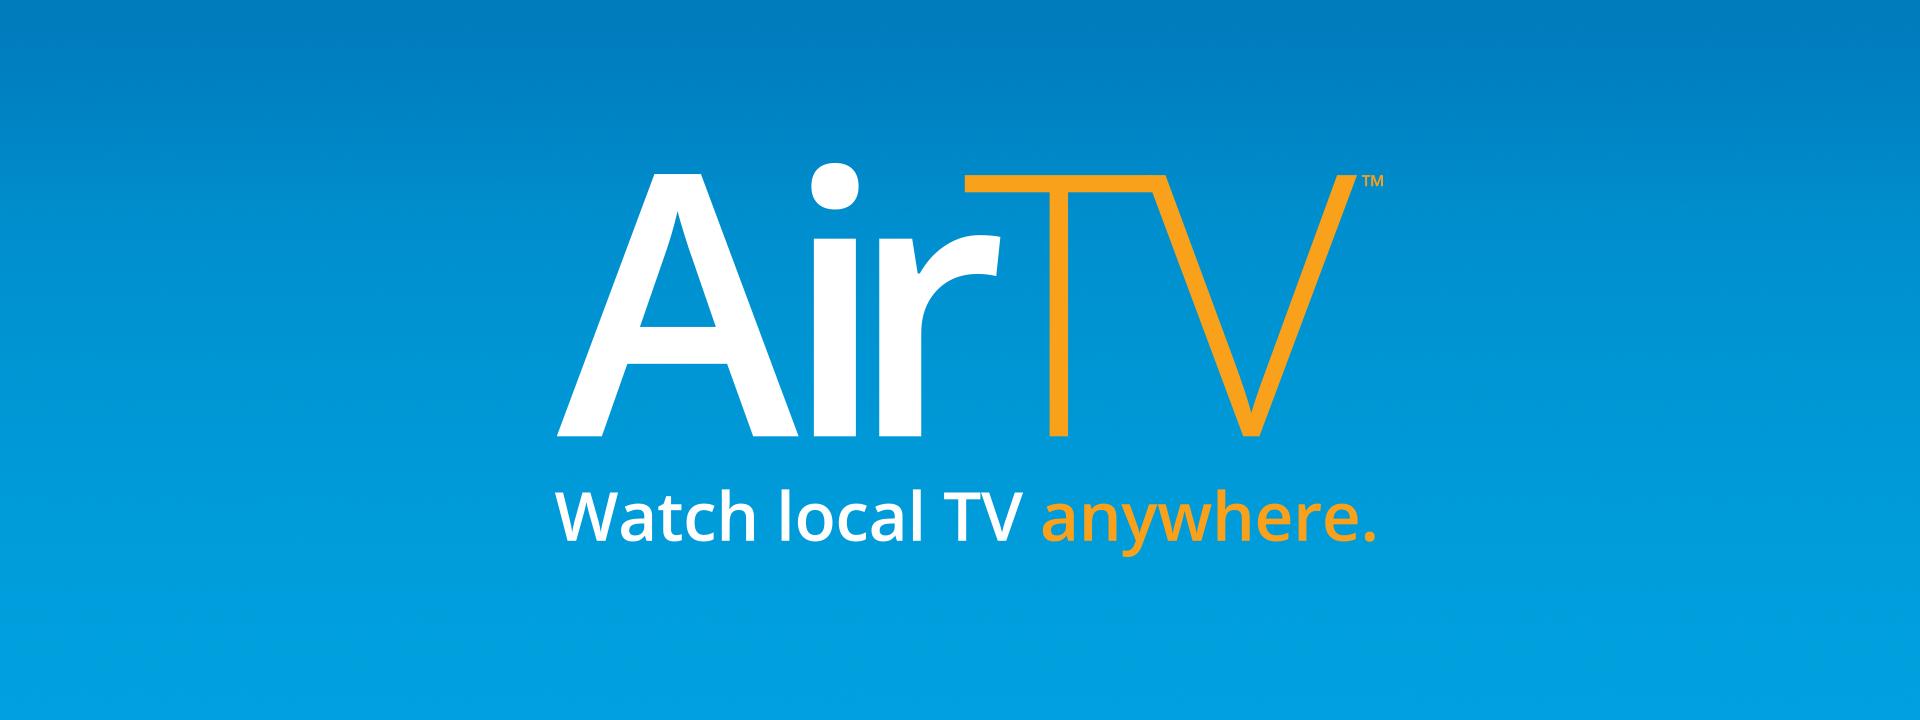 airtv-watch-local-tv-anywhere